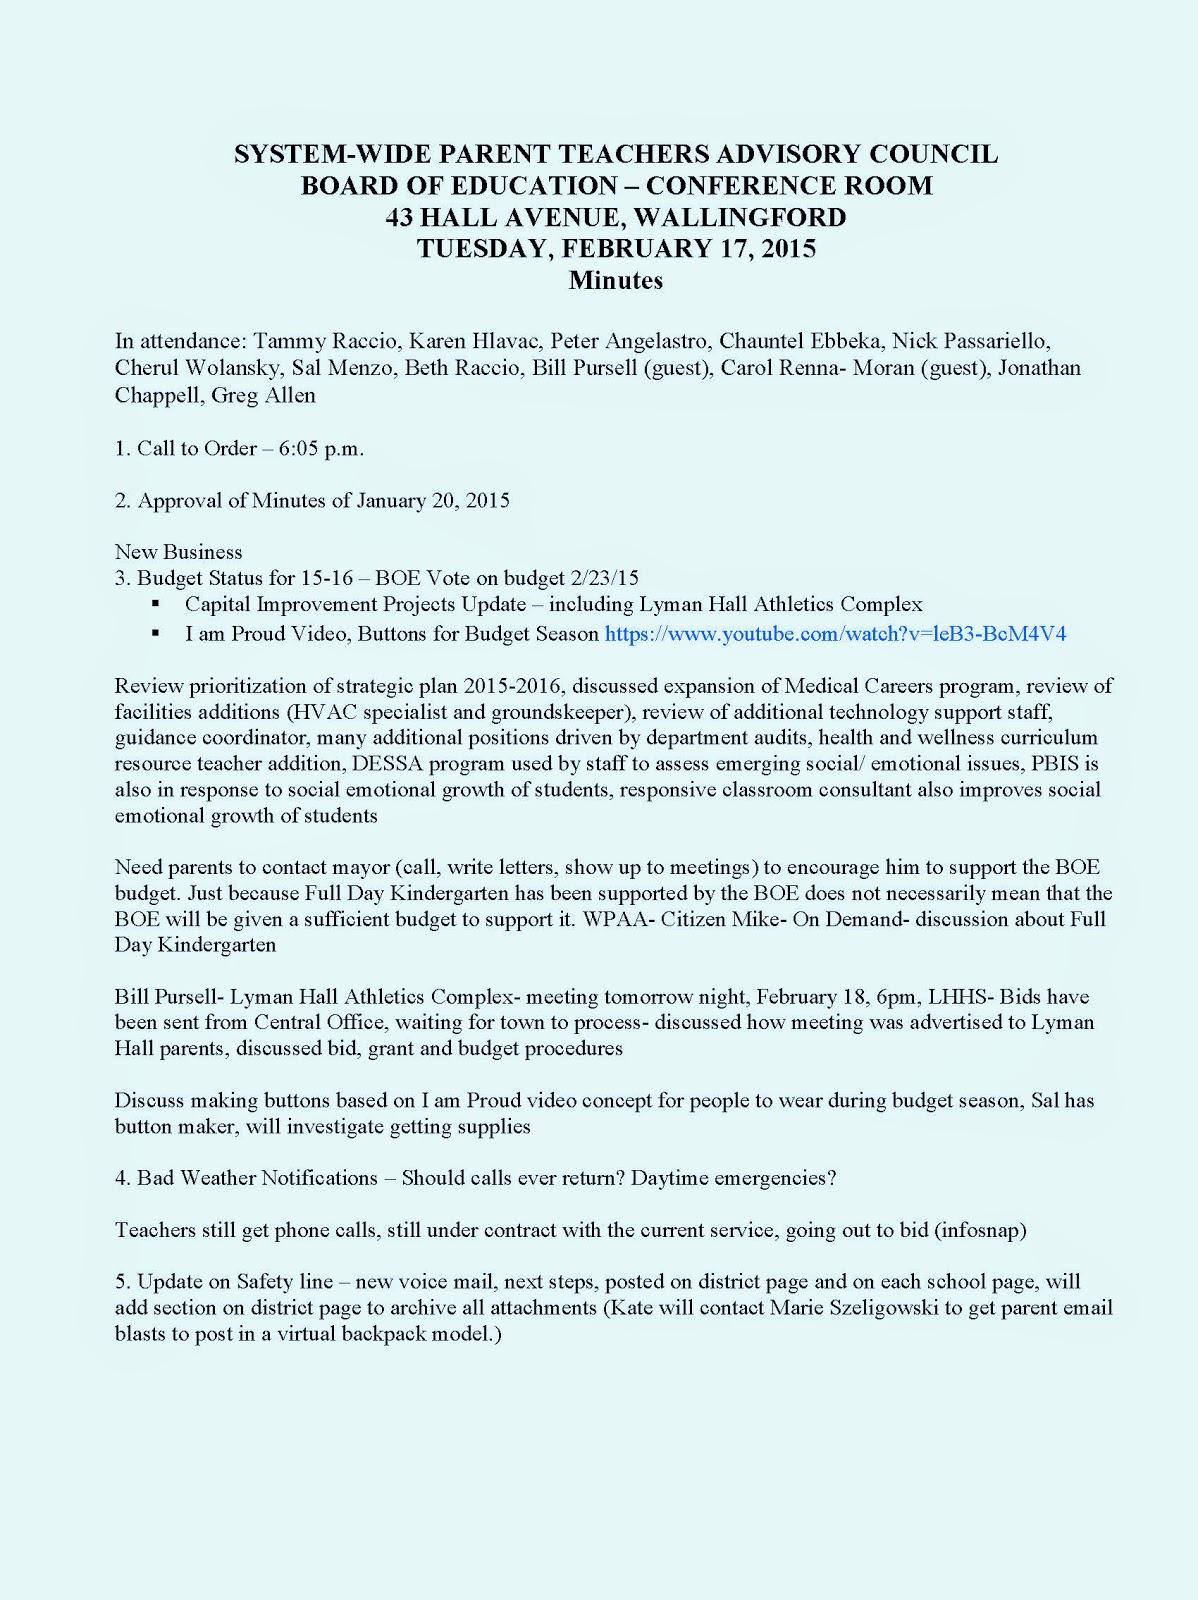 Wallingford System-Wide Parent Teacher Advisory Council: March 2015